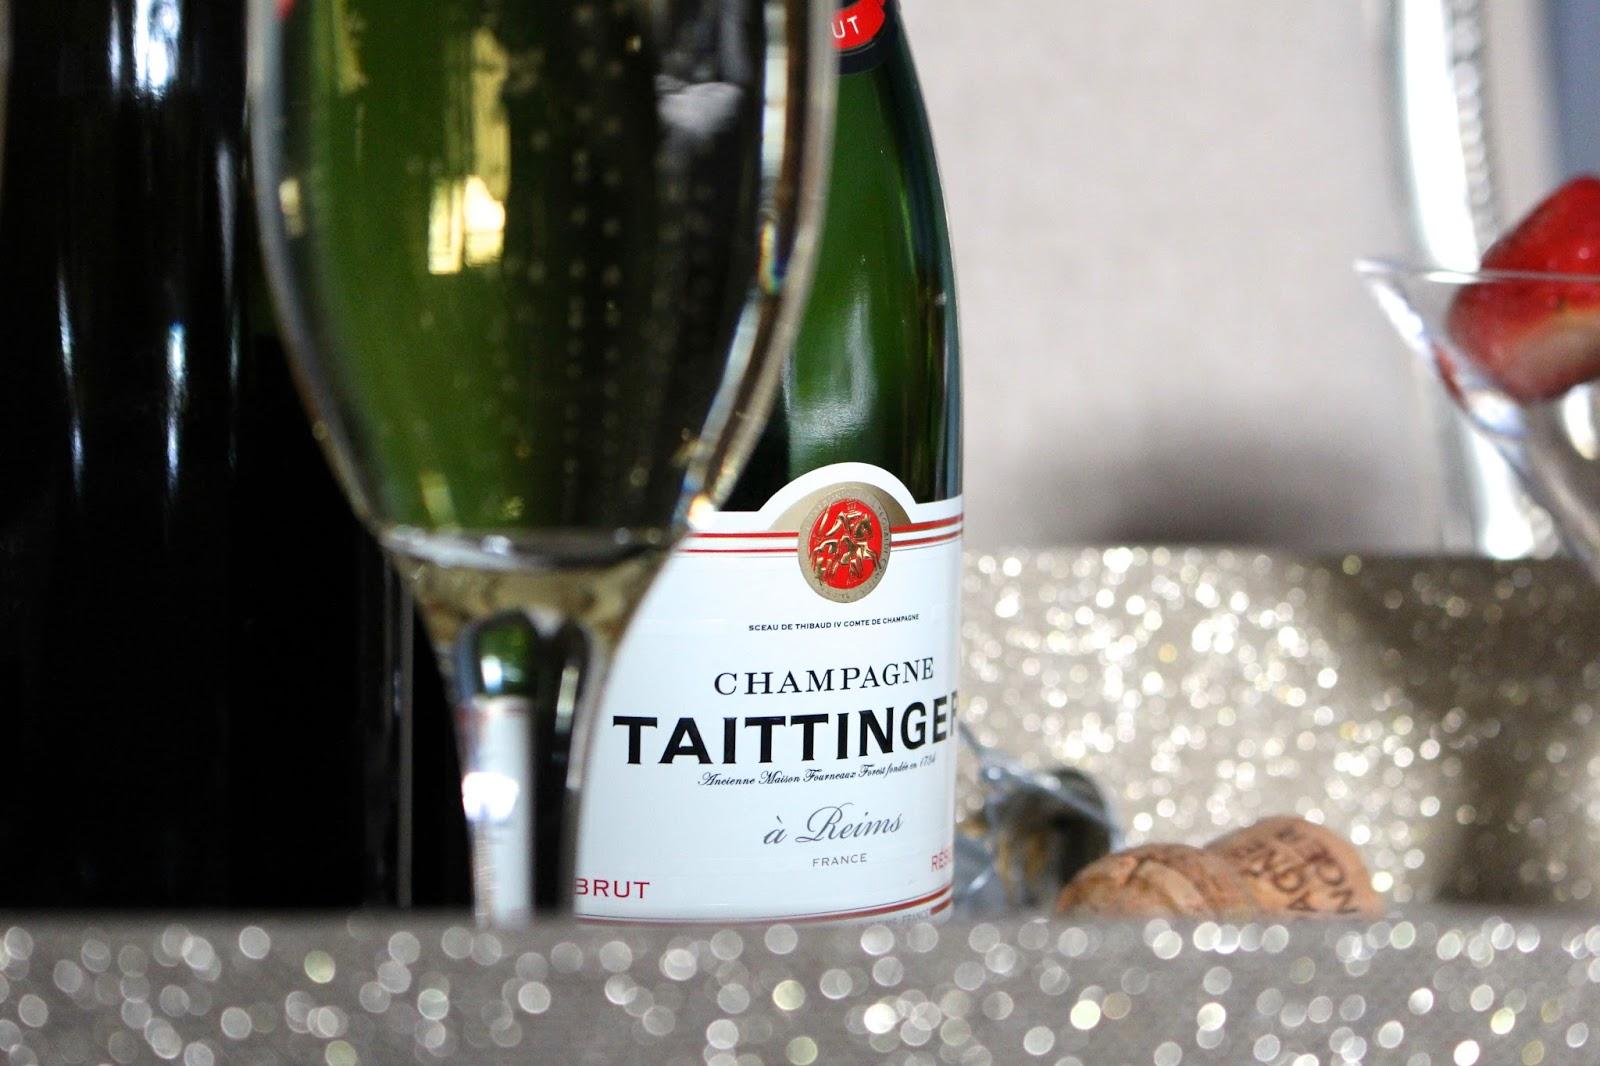 Taittinger Champagne BAFTA 2016